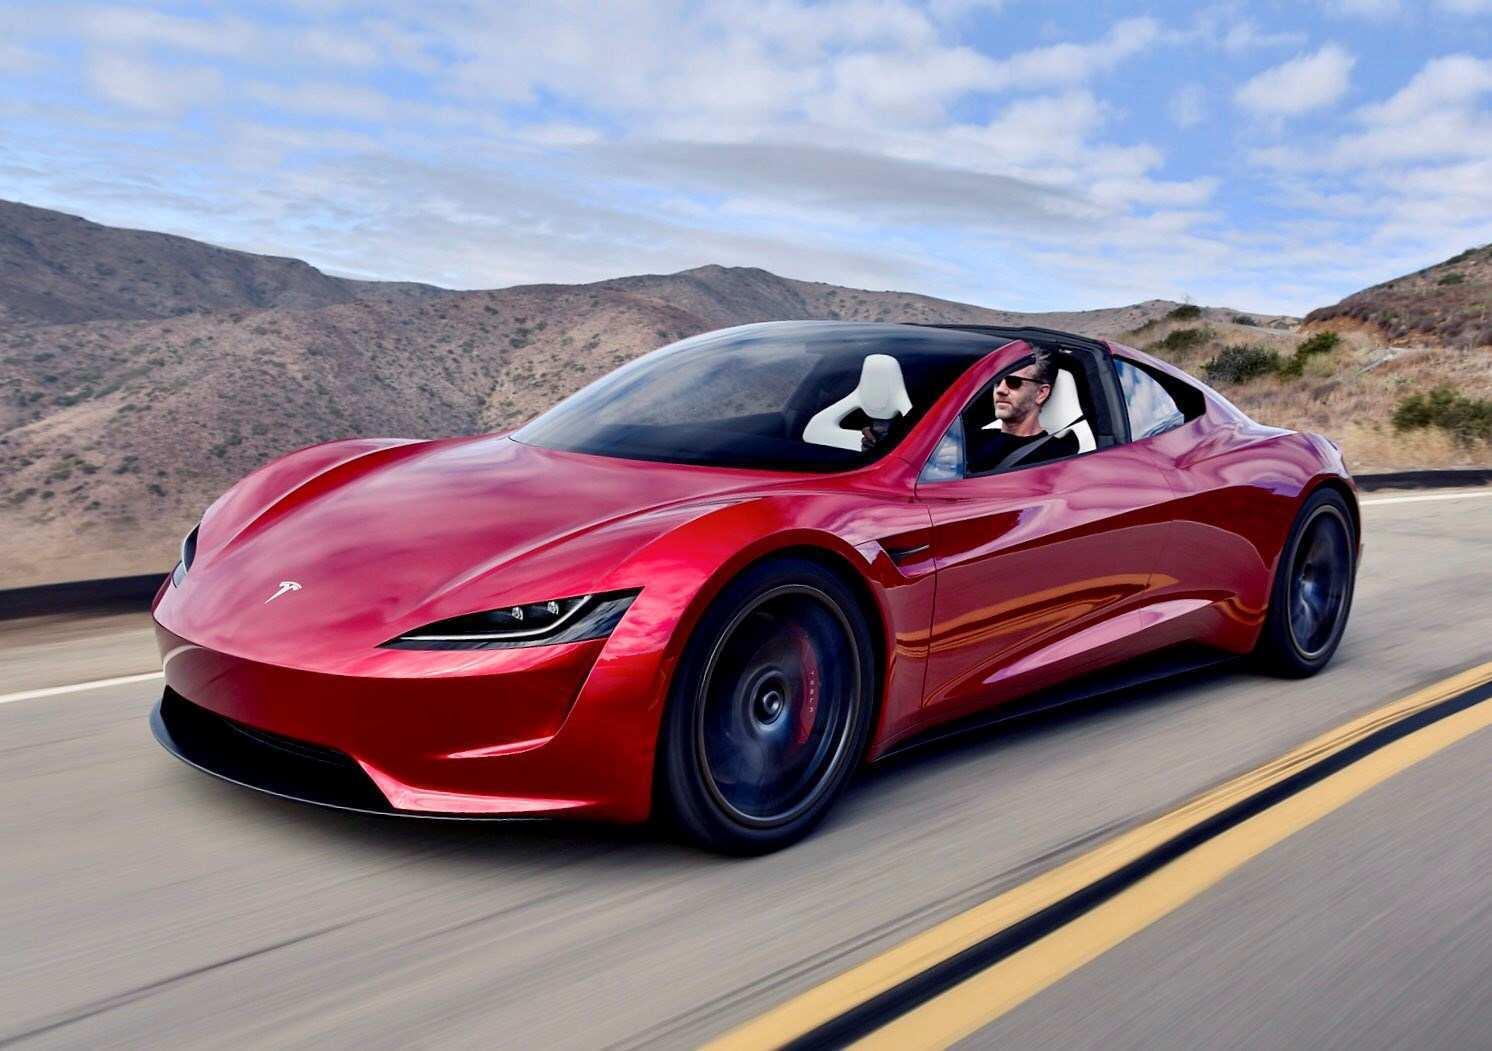 93 All New Tesla Goal 2020 History for Tesla Goal 2020